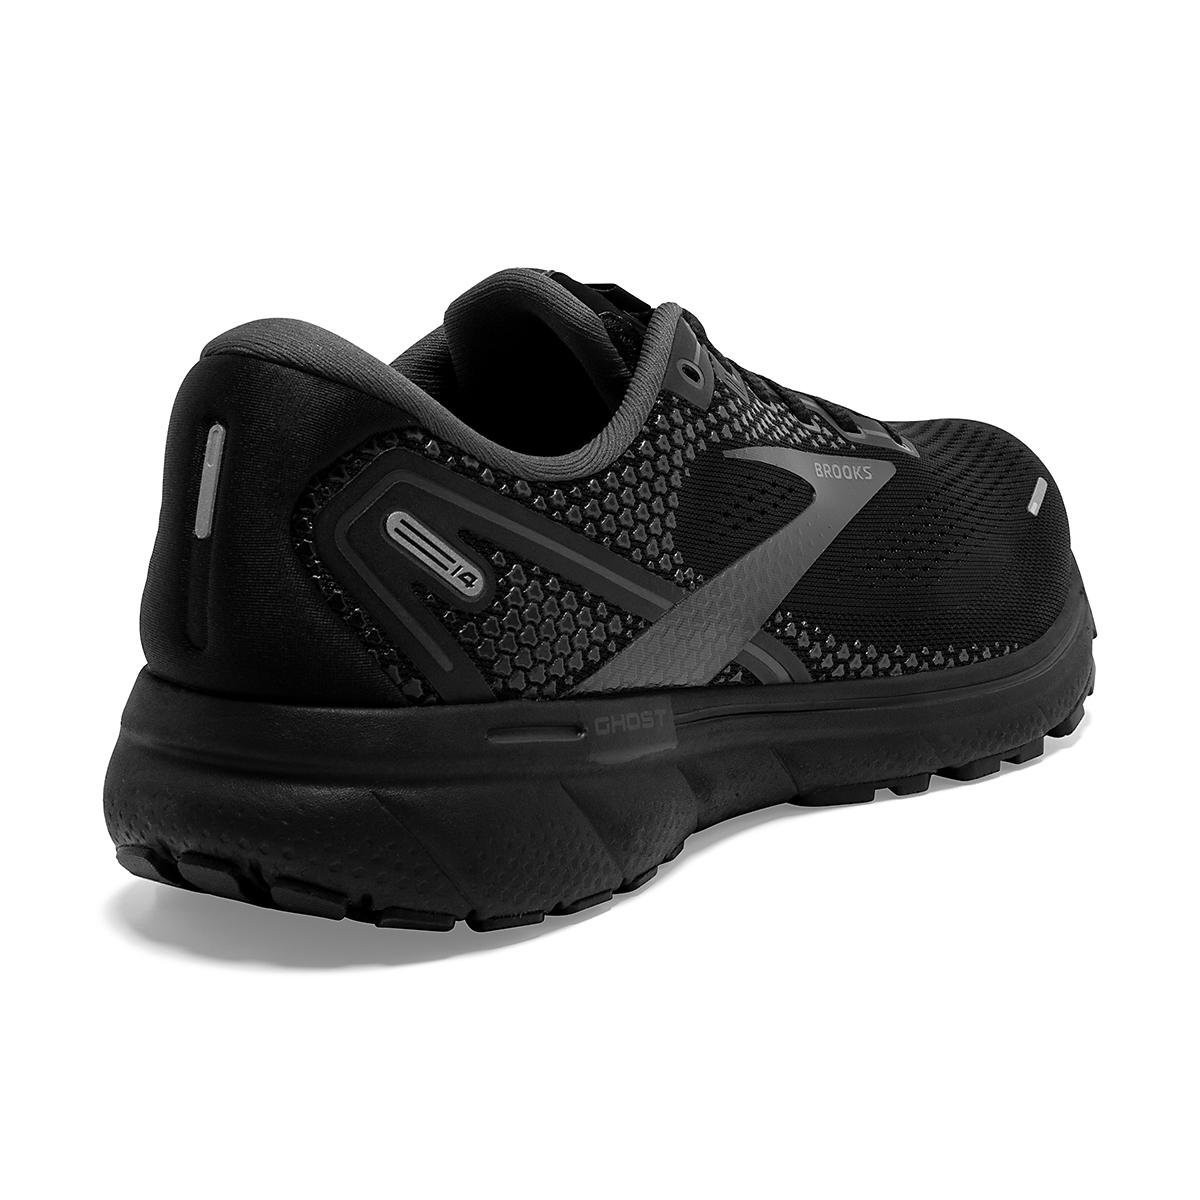 Men's Brooks Ghost 14 Running Shoe - Color: Black/Black/Ebony - Size: 7 - Width: Regular, Black/Black/Ebony, large, image 6